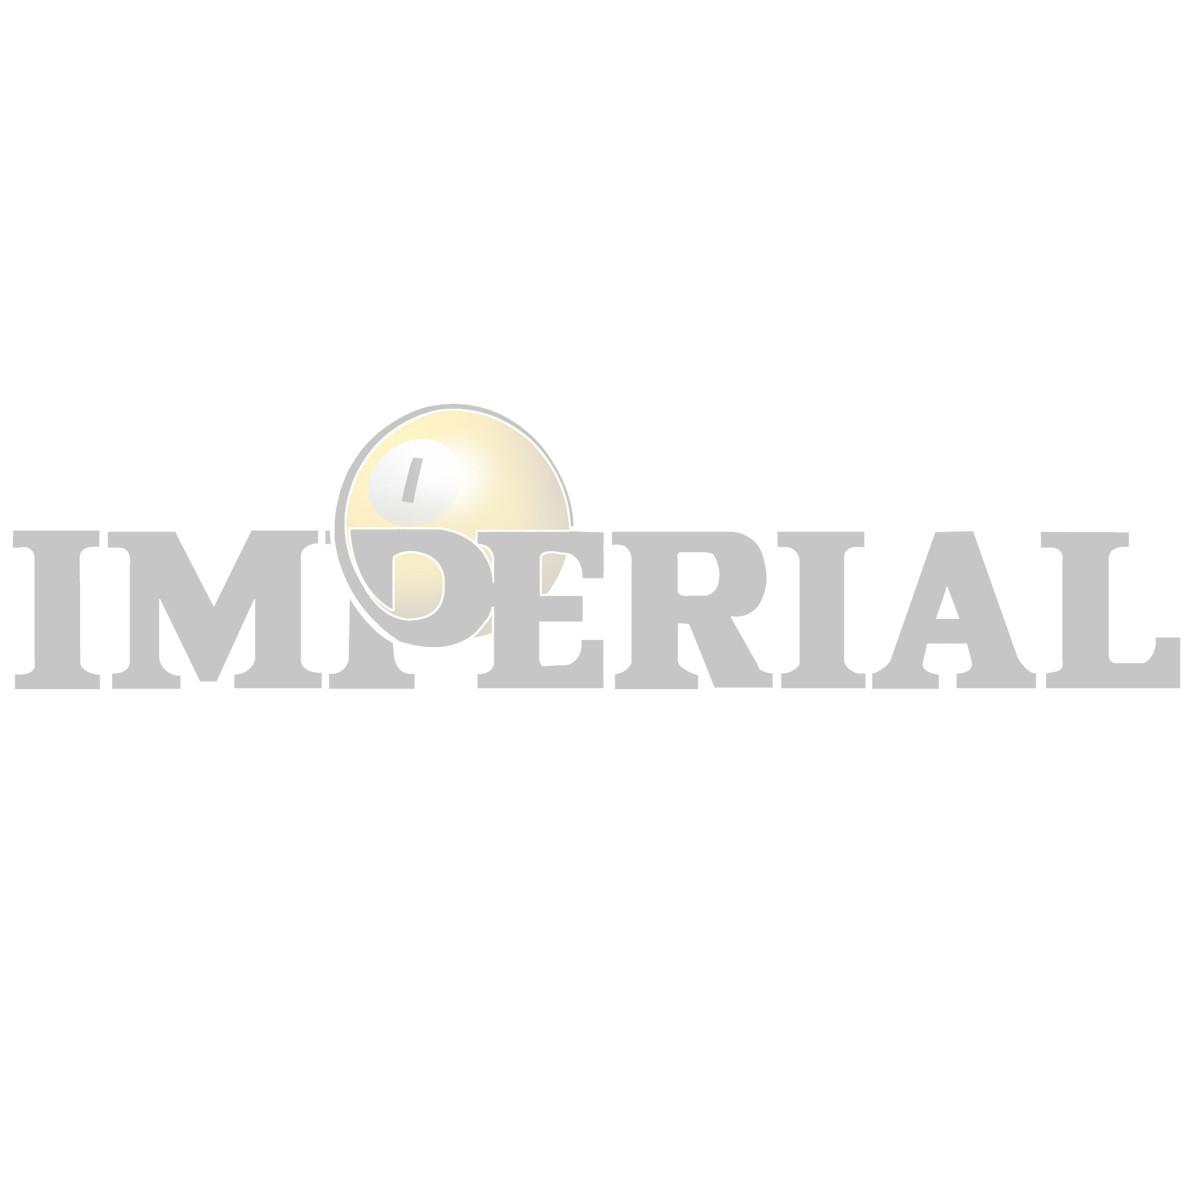 Colorado Rockies Home vs. Away Billiard Ball Set